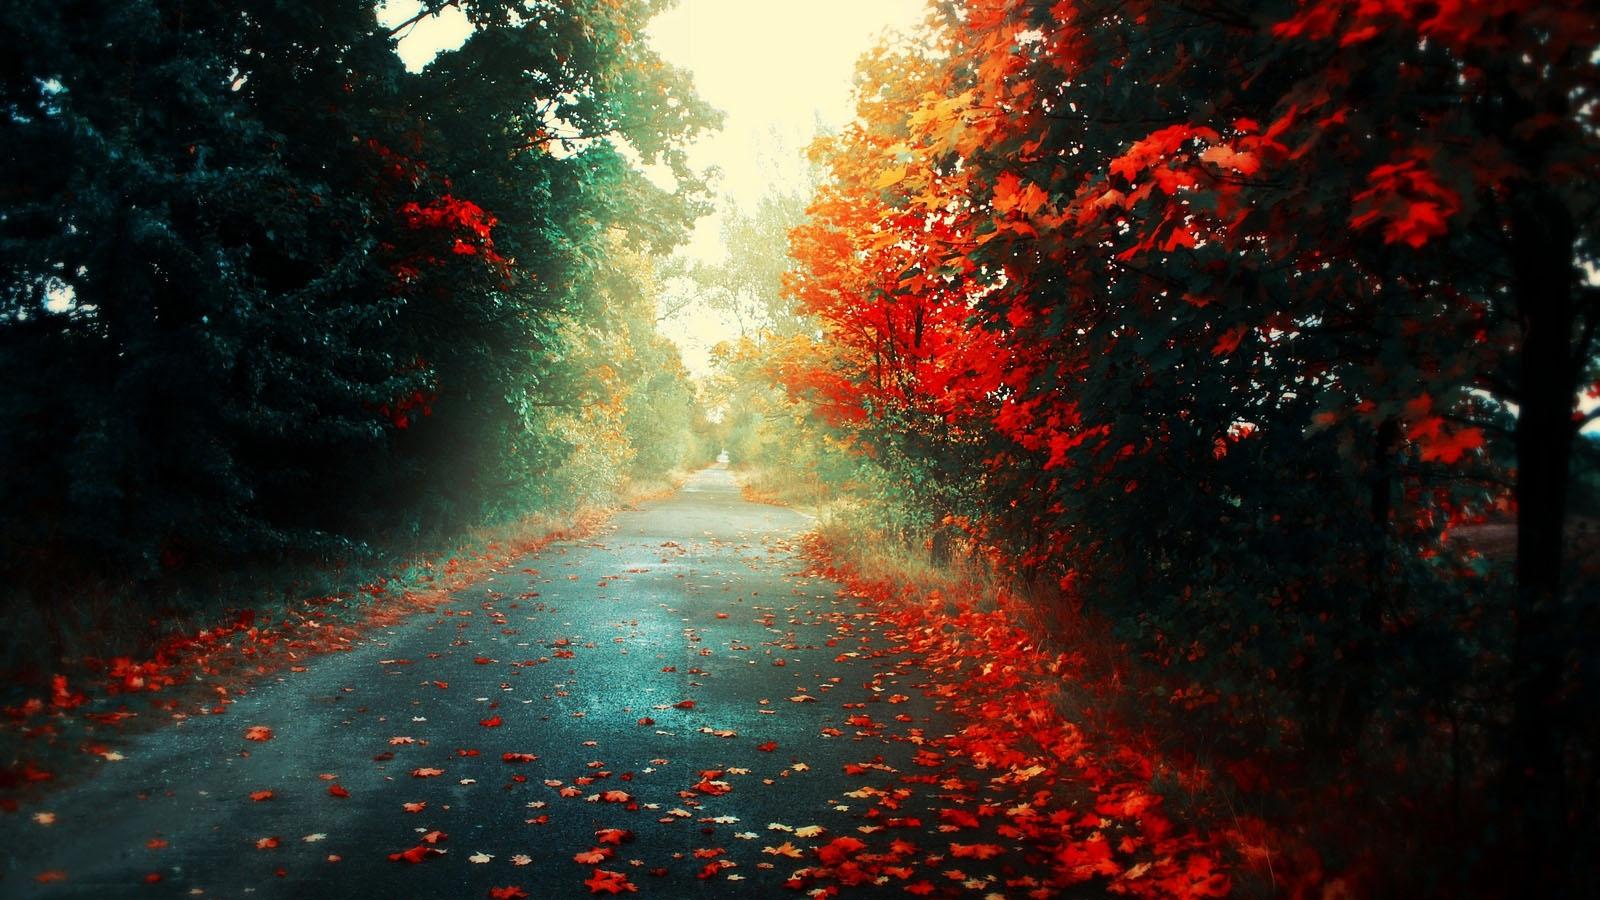 BeautifulFlowersinrainLatest-1920%C3%97-Rainy-Images-Adorable-wallpaper-wpc5802701